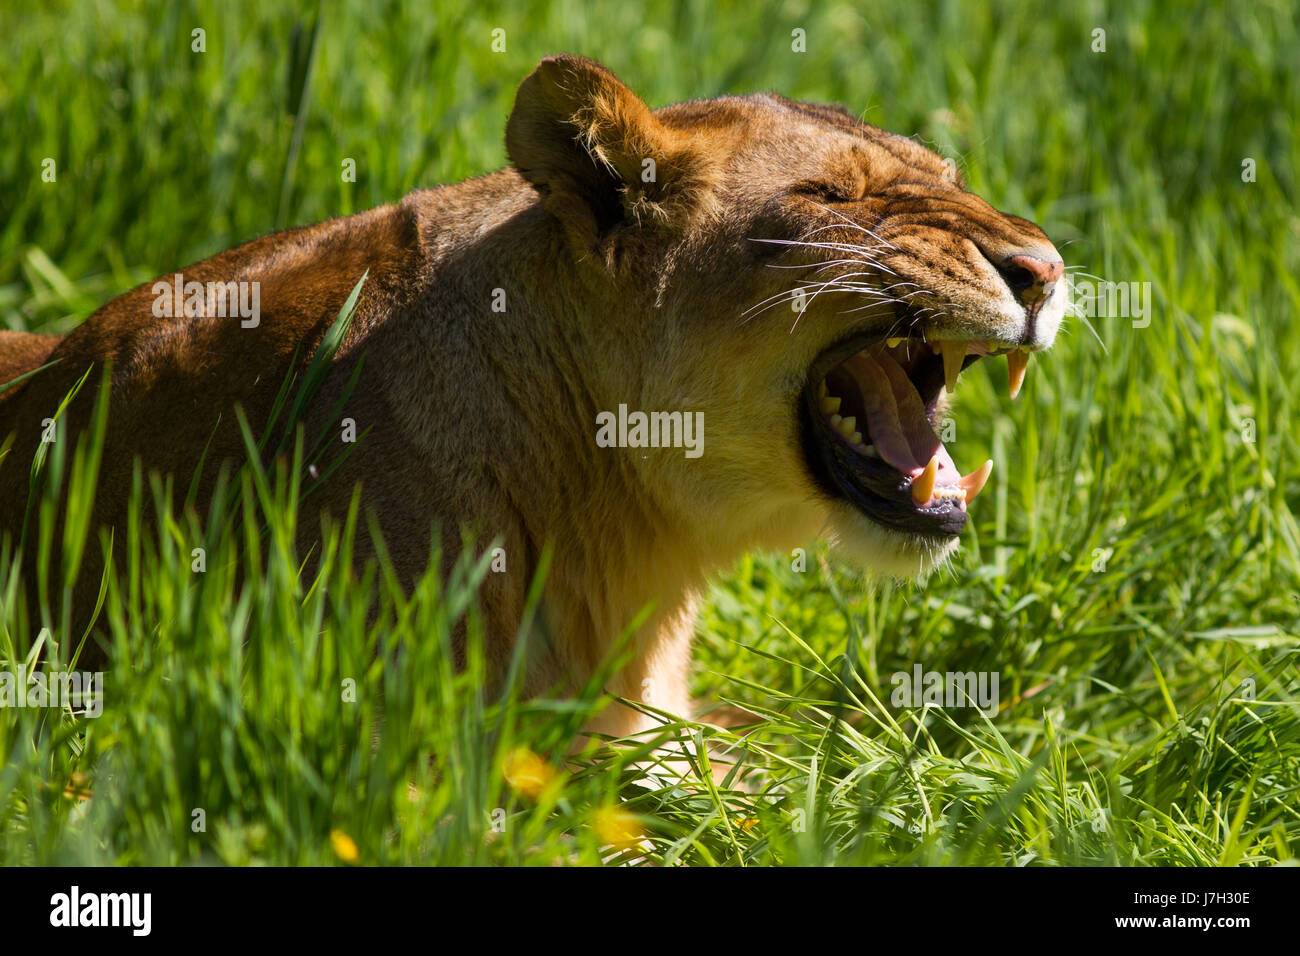 Lion at Knowsley Safari Park, Prescot, Merseyside, UK - Stock Image